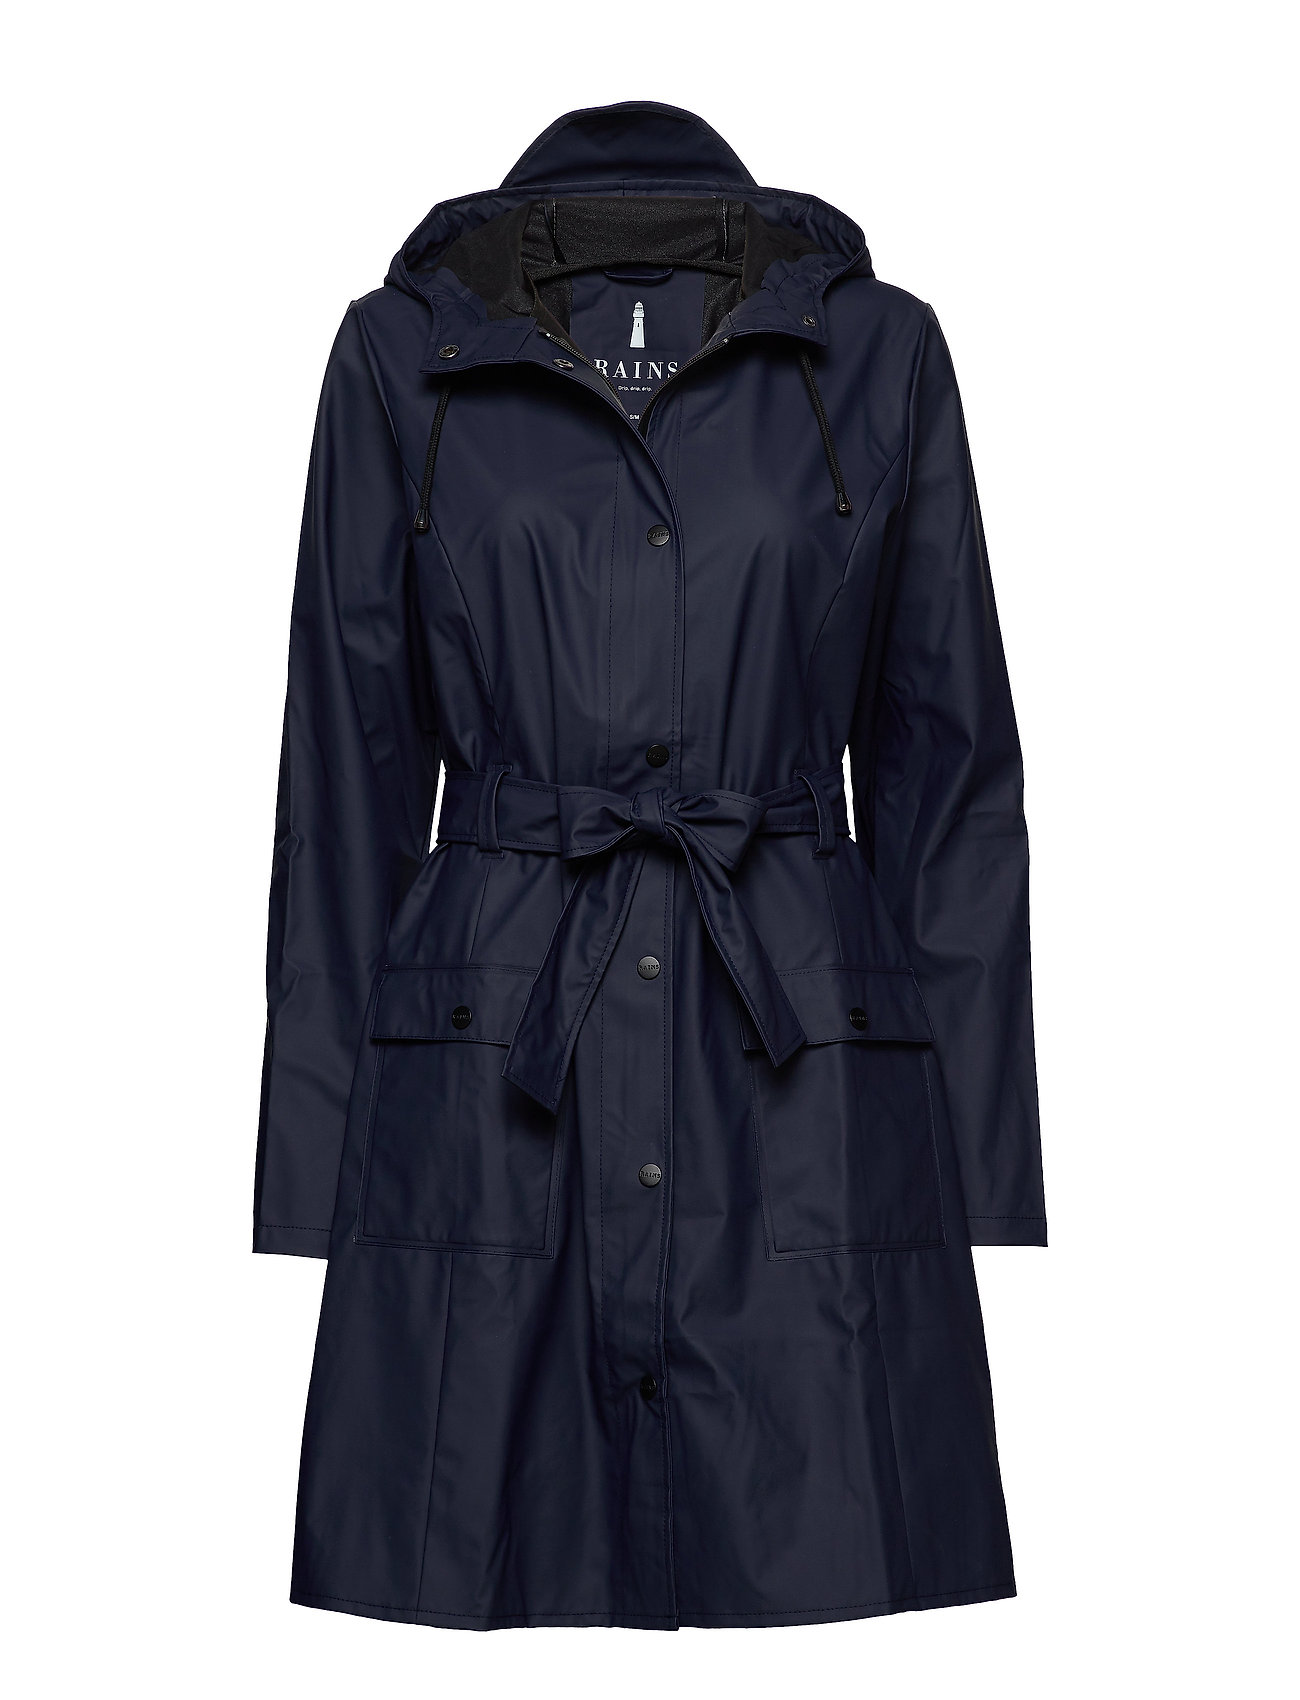 Rains Curve Jacket - 02 Blue